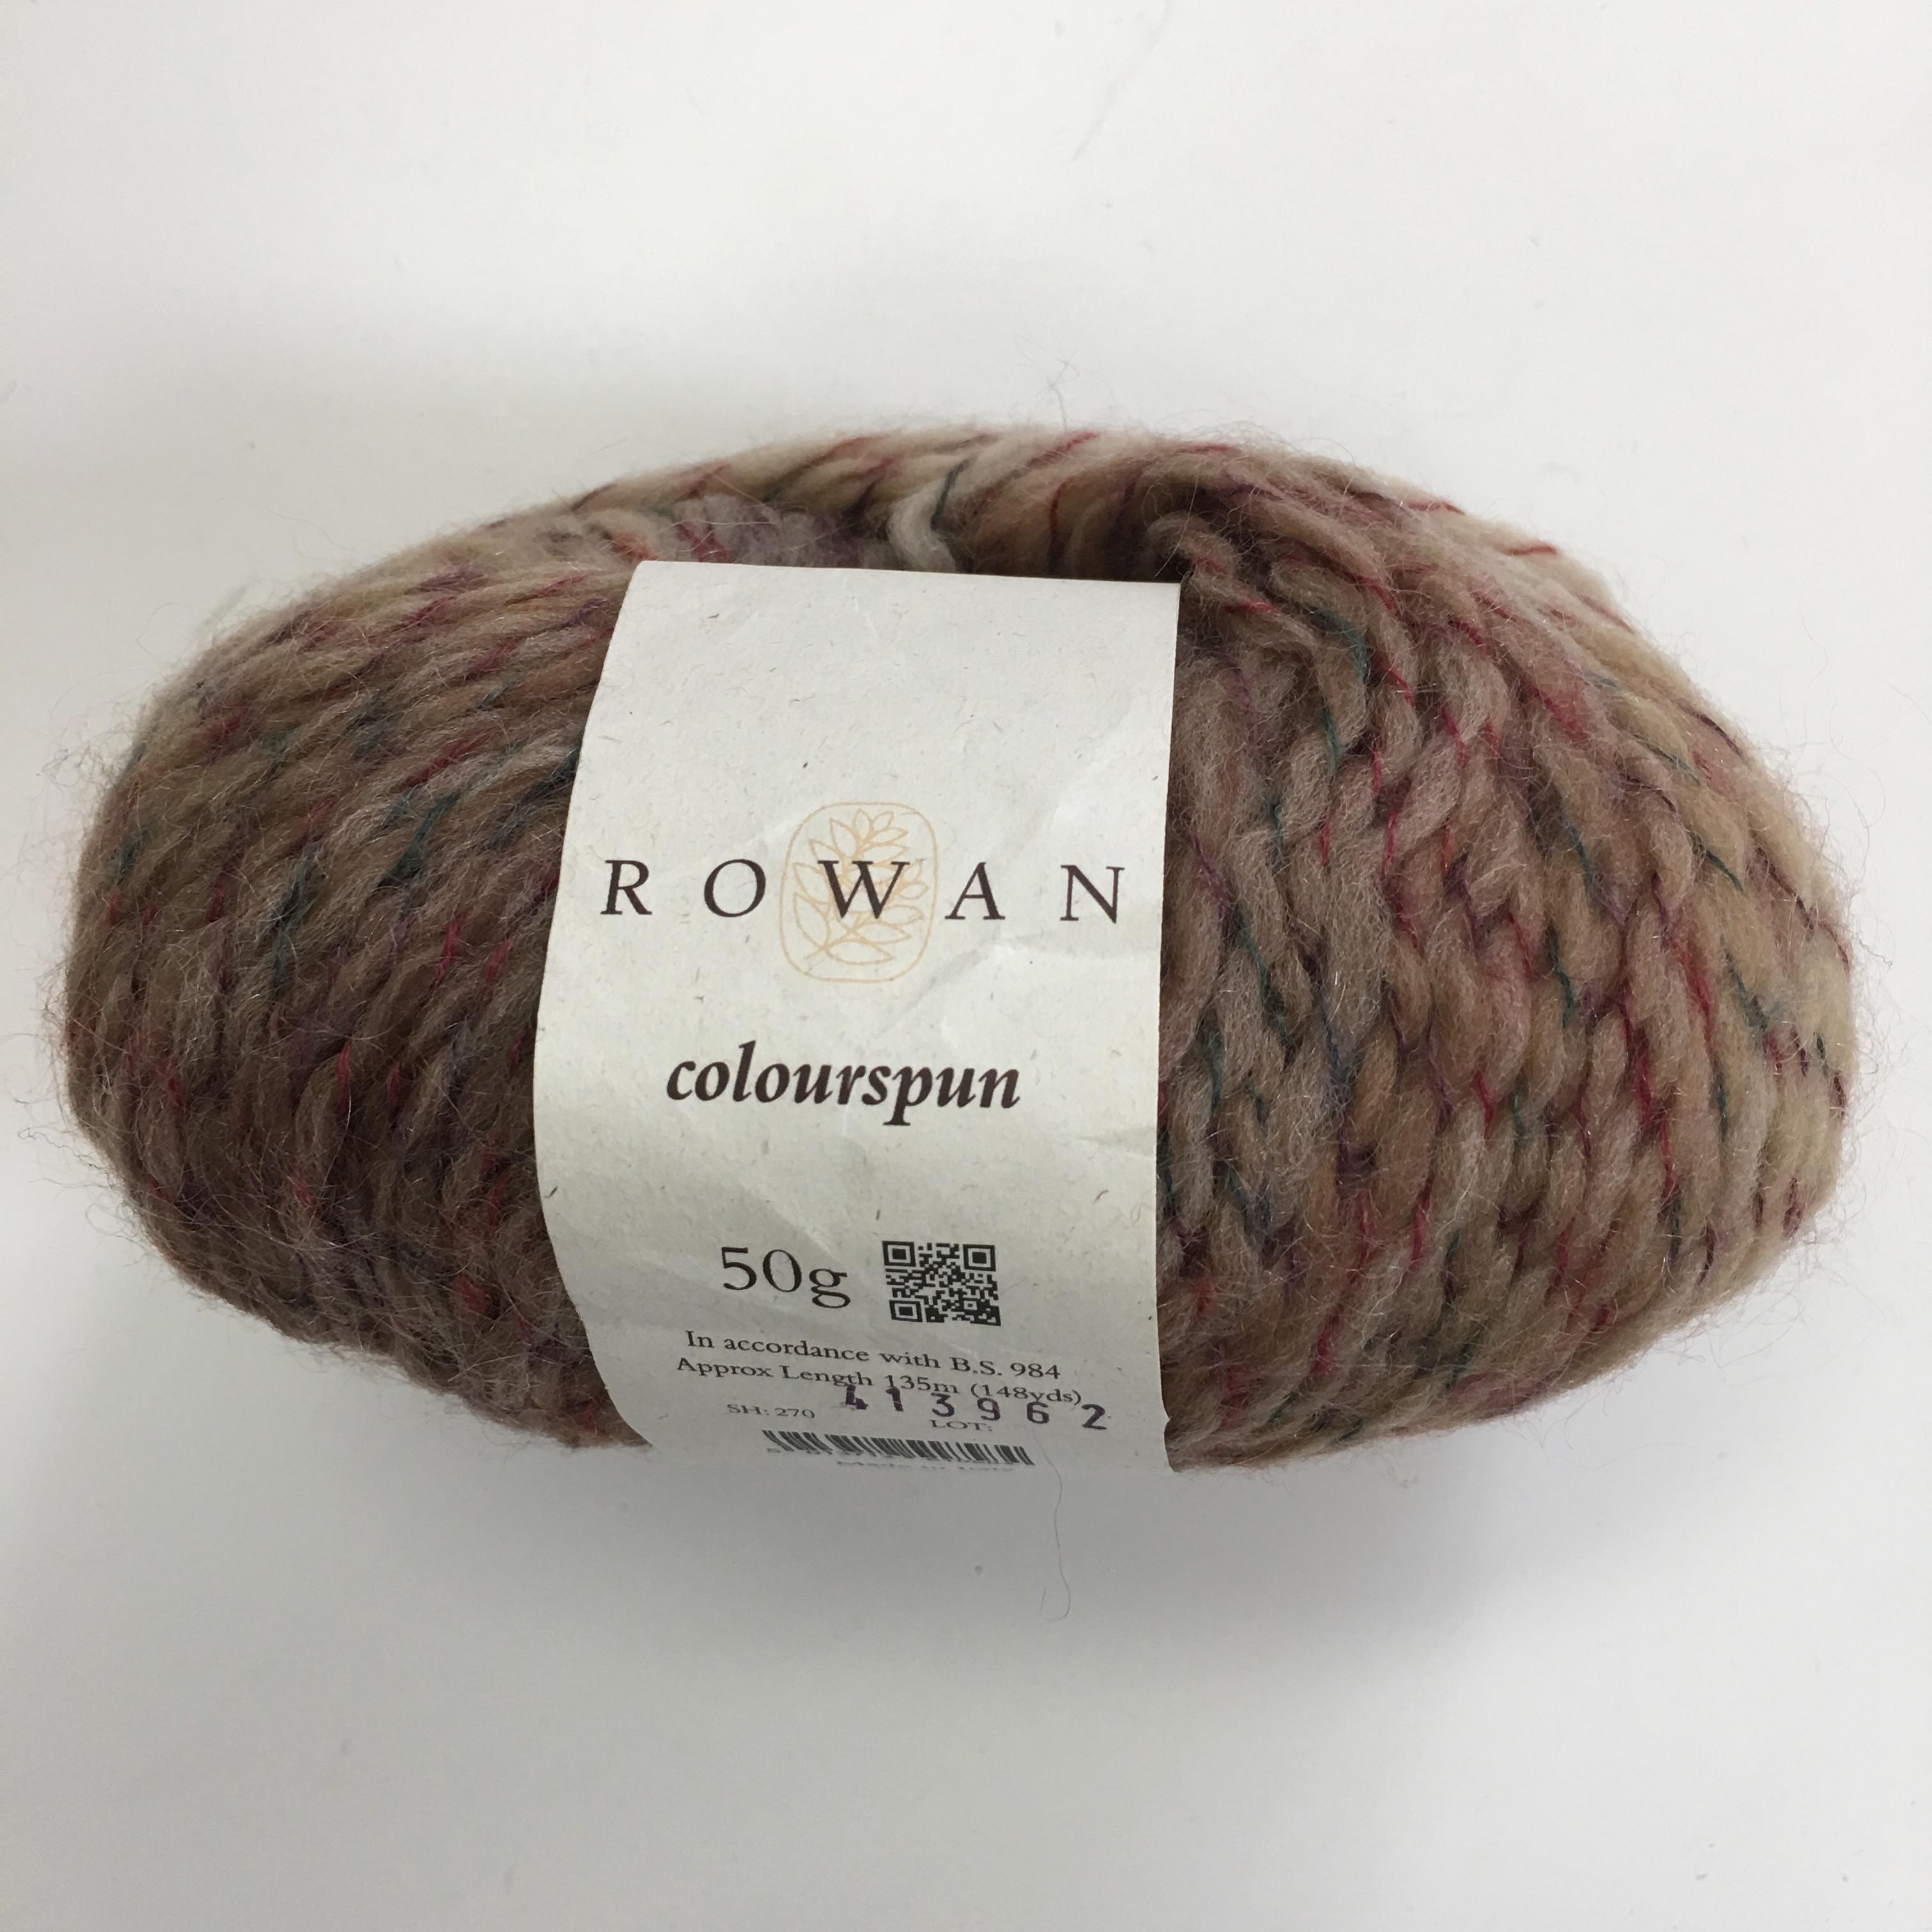 Rowan|Colourspun Offerta pacco da 8 gomitoli